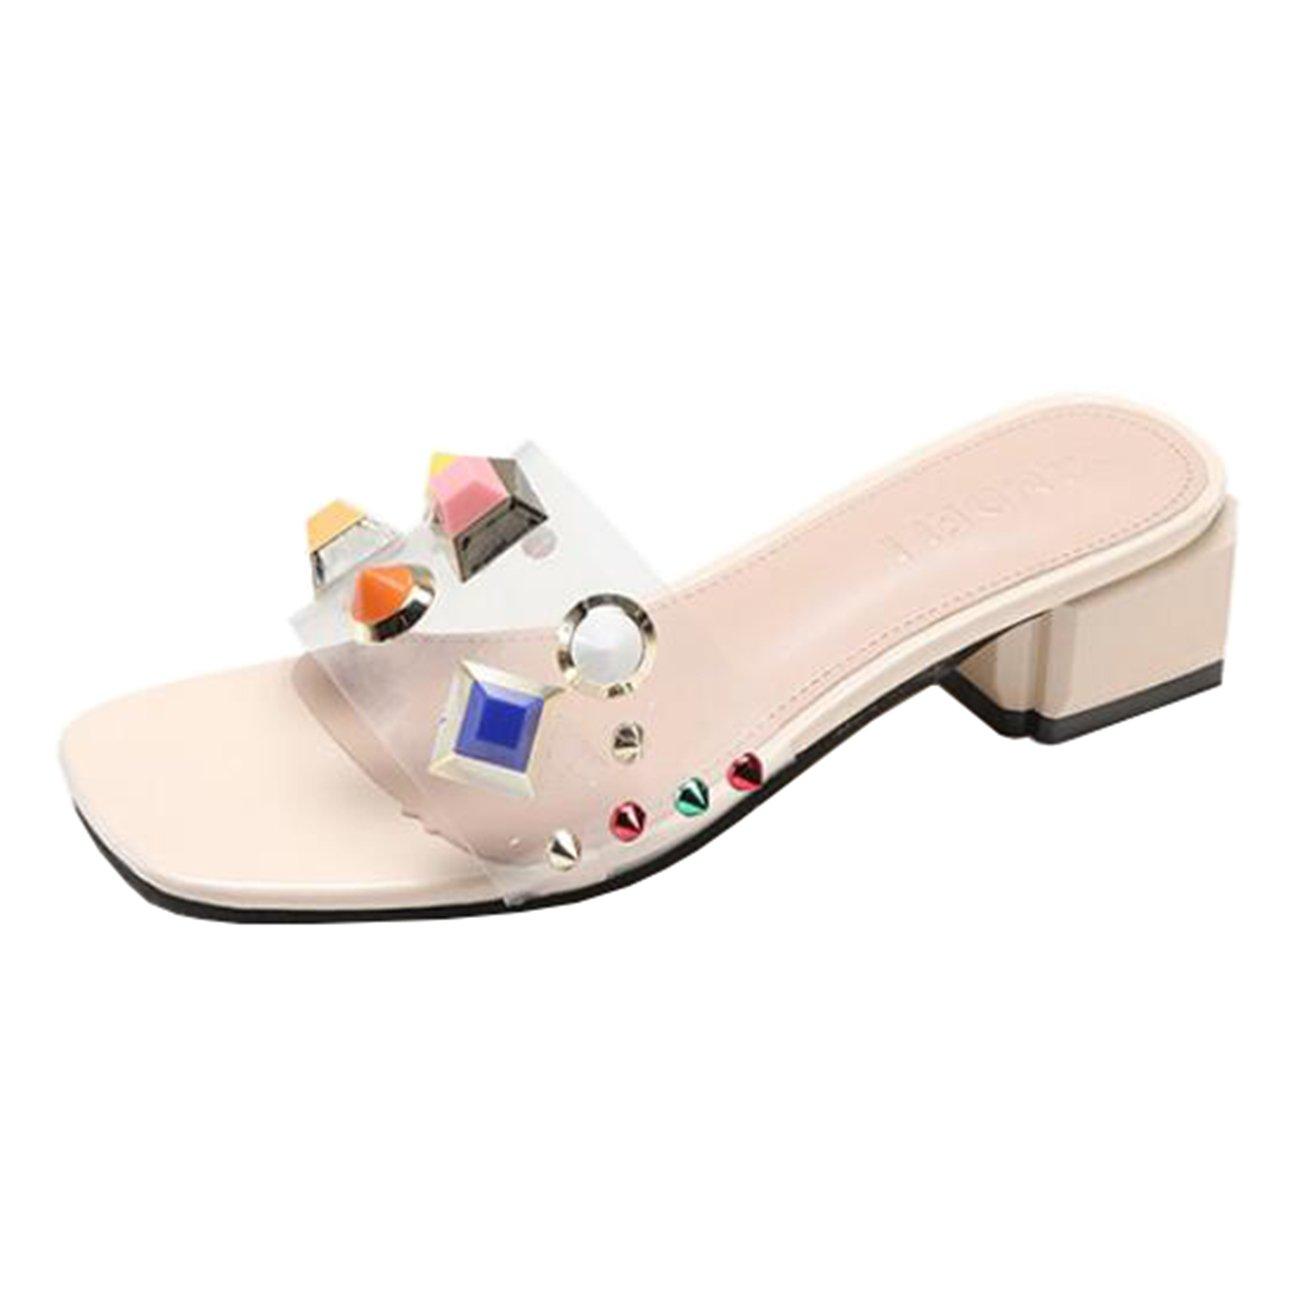 Mashiaoyi Damen Peep-Toe Blockabsatz Ohne Verschluss Niet Sandalen Beige